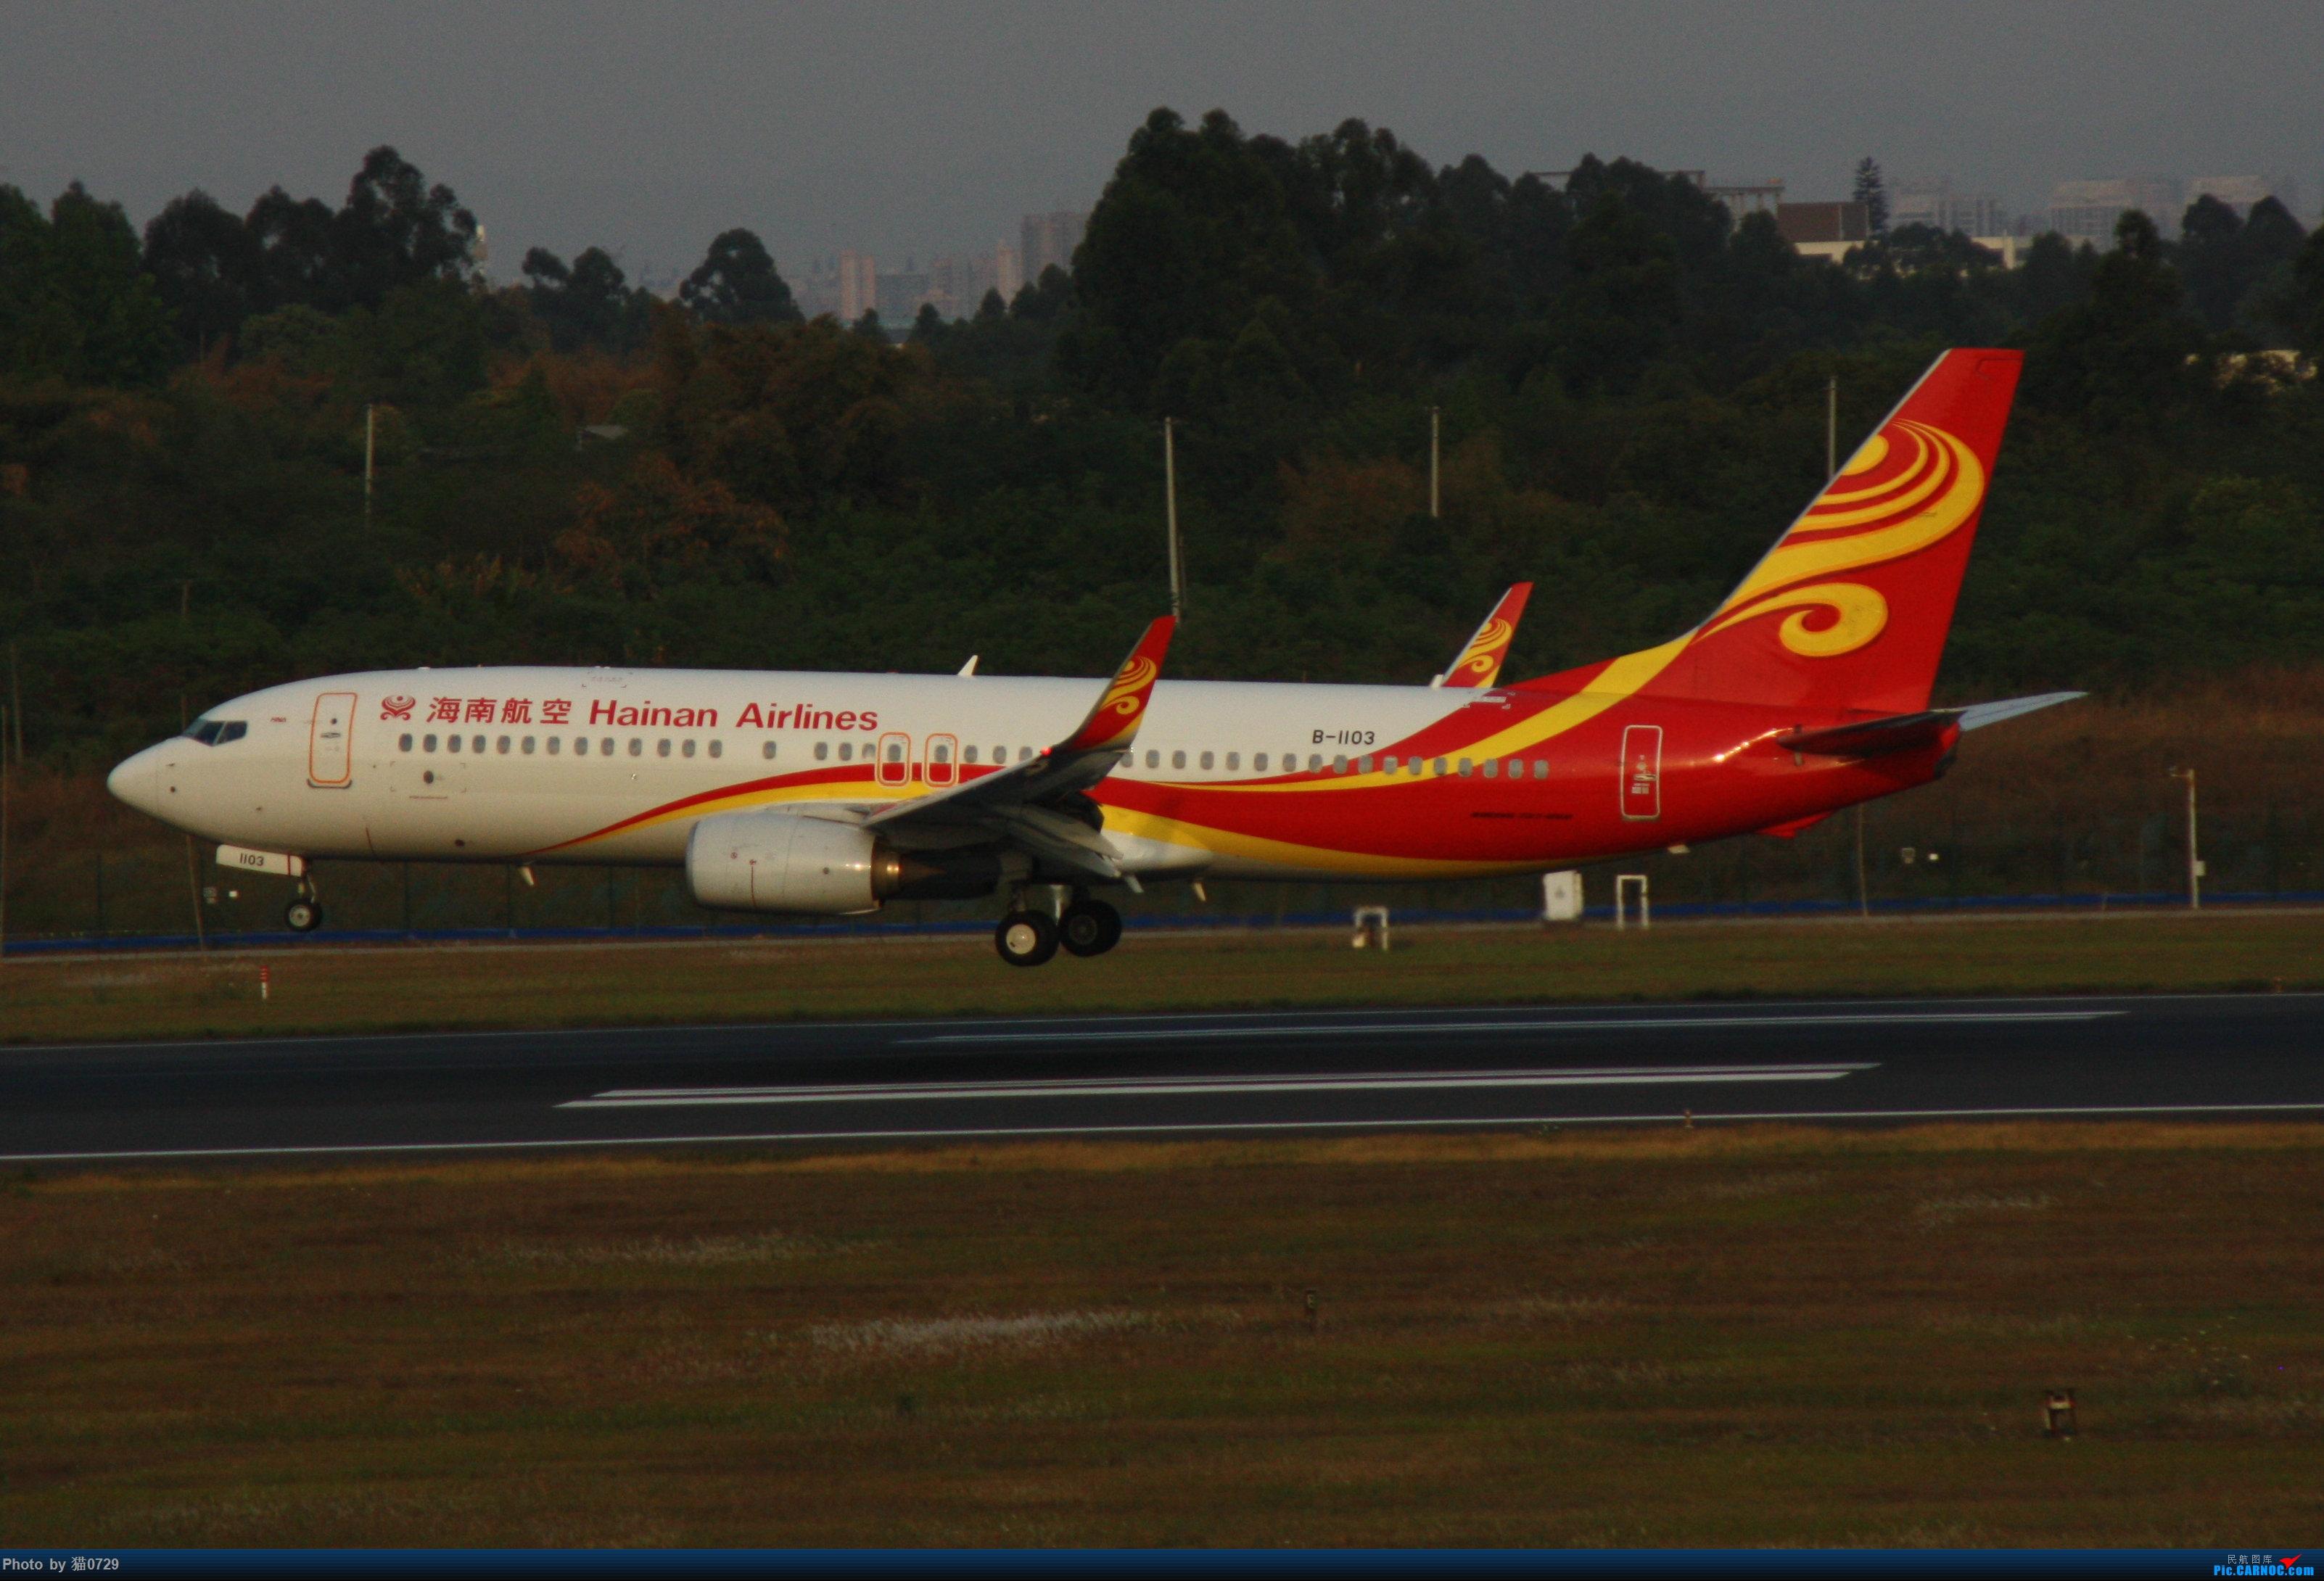 Re:[原创]CTU 119.425 水泥 伊朗346 巴基斯坦777 BOEING 737-800 B-1103 中国成都双流国际机场